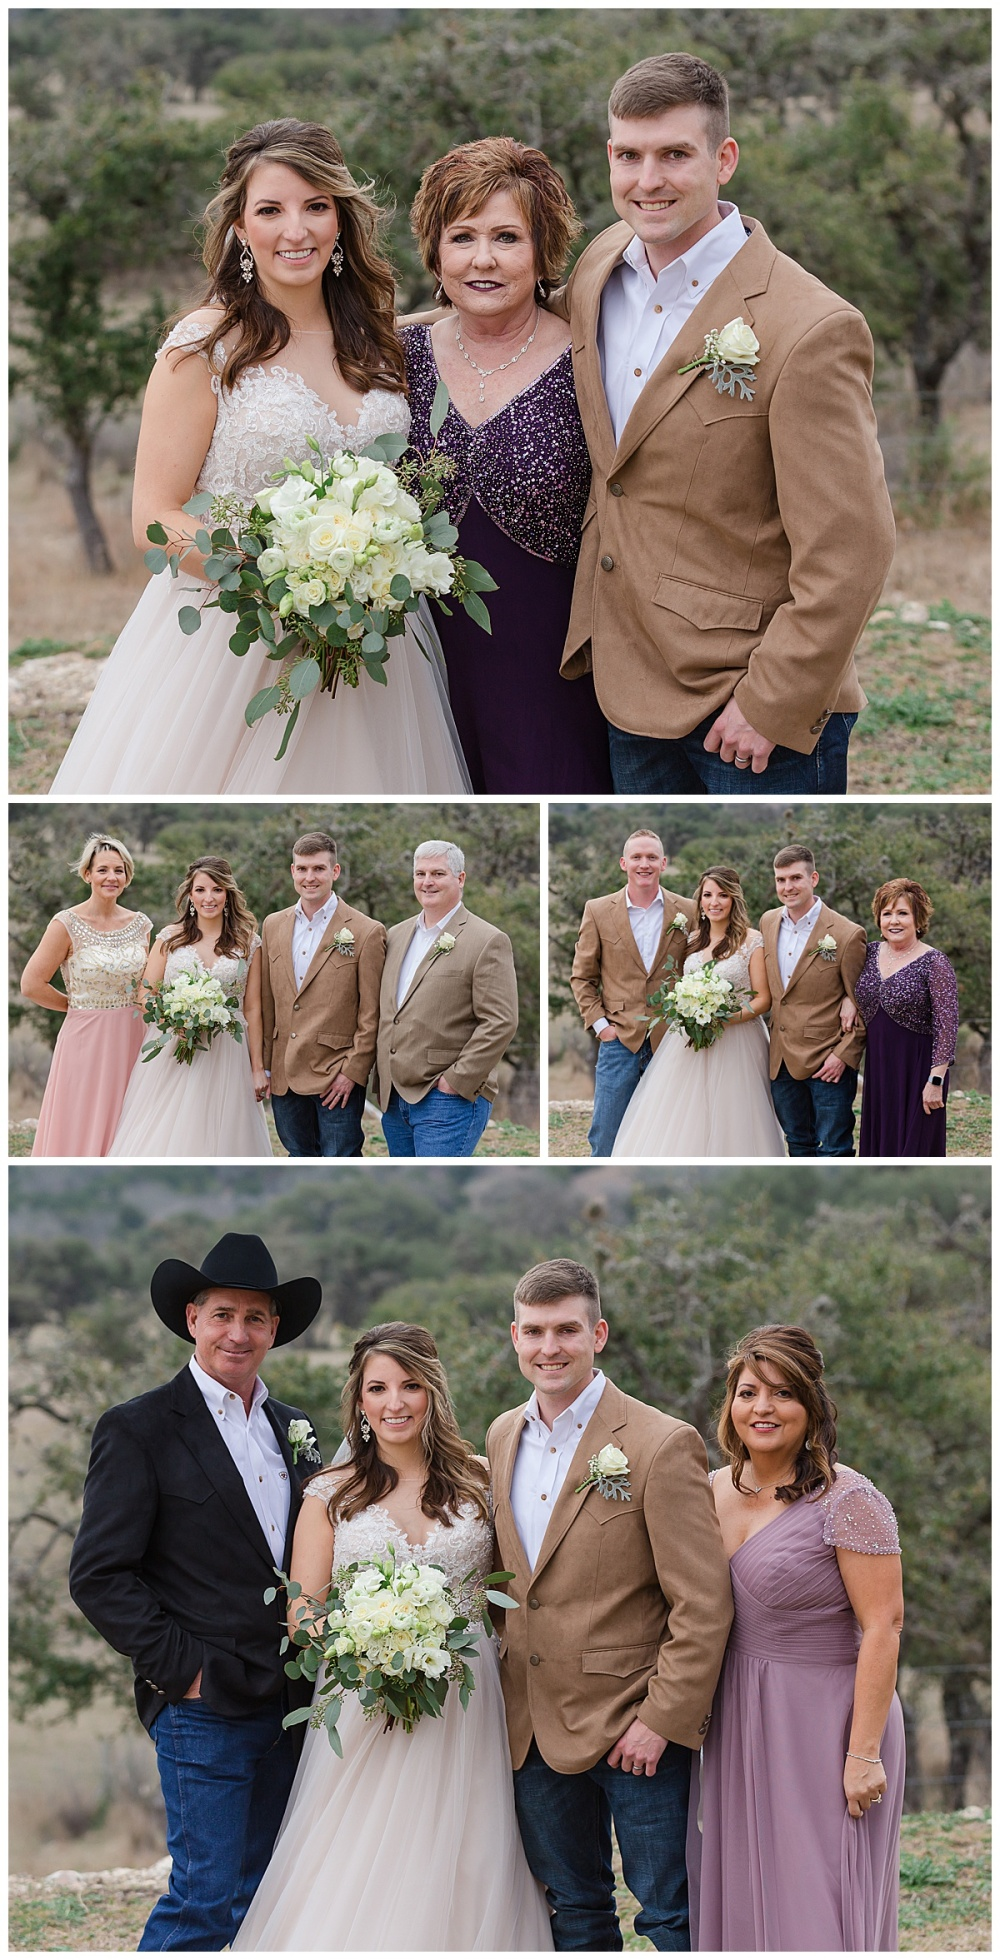 Wedding-Photographer-Texas-Hill-Country-Happy-H-Ranch-Comfor-Texas-Carly-Barton-Photography_0034.jpg